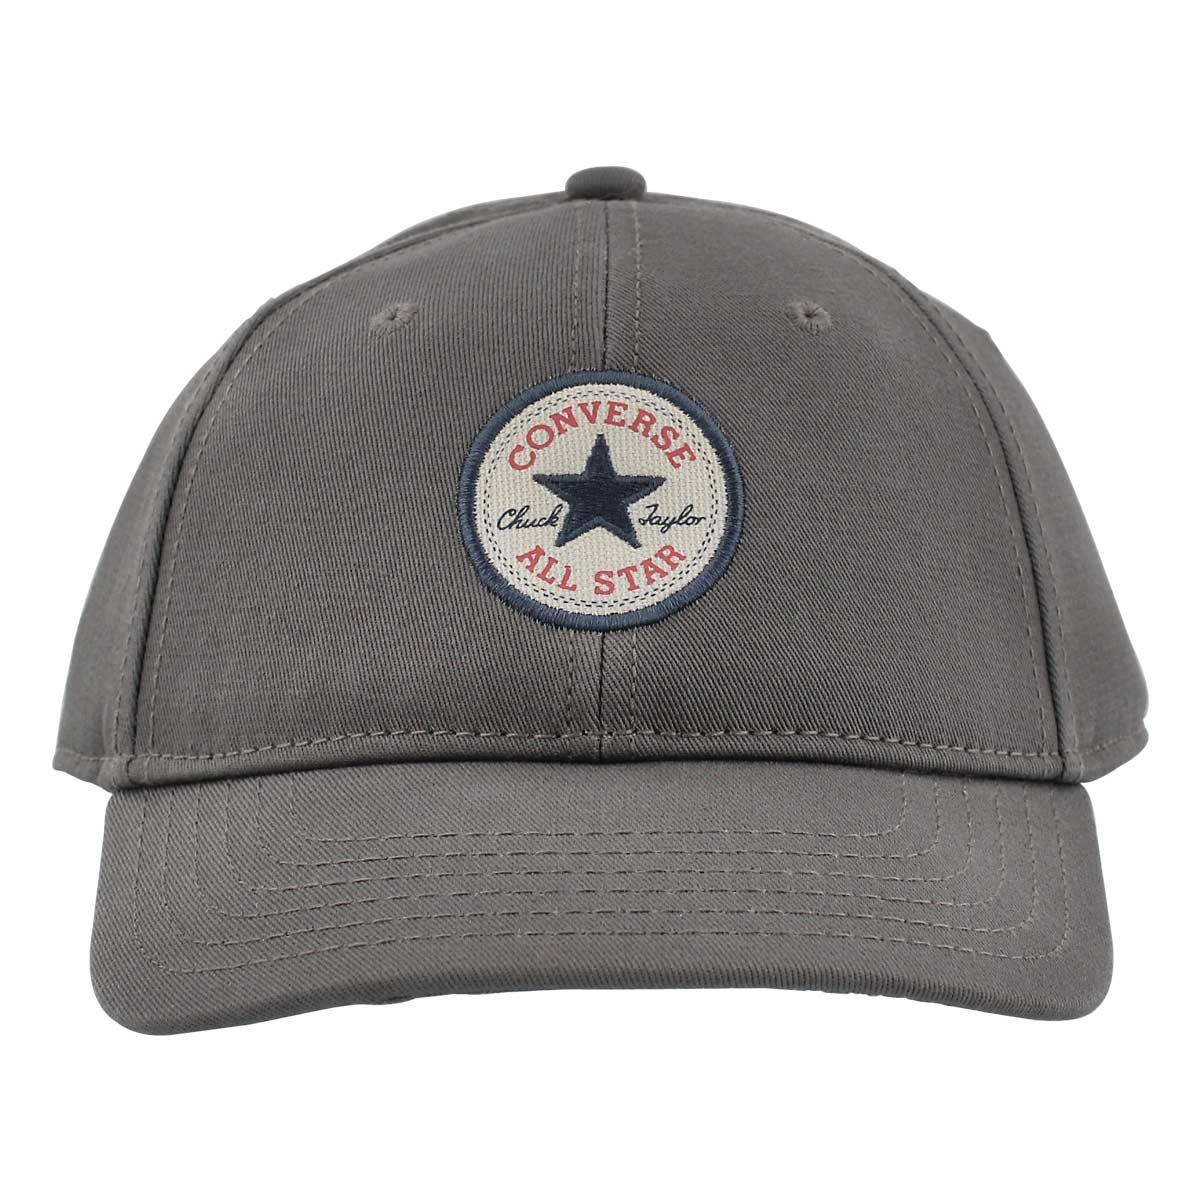 69c38dd3e972 Converse Women s CORE charcoal adjustable precurve cap Women s Accessories  Grey. Lds Core char adjustable precurve cap